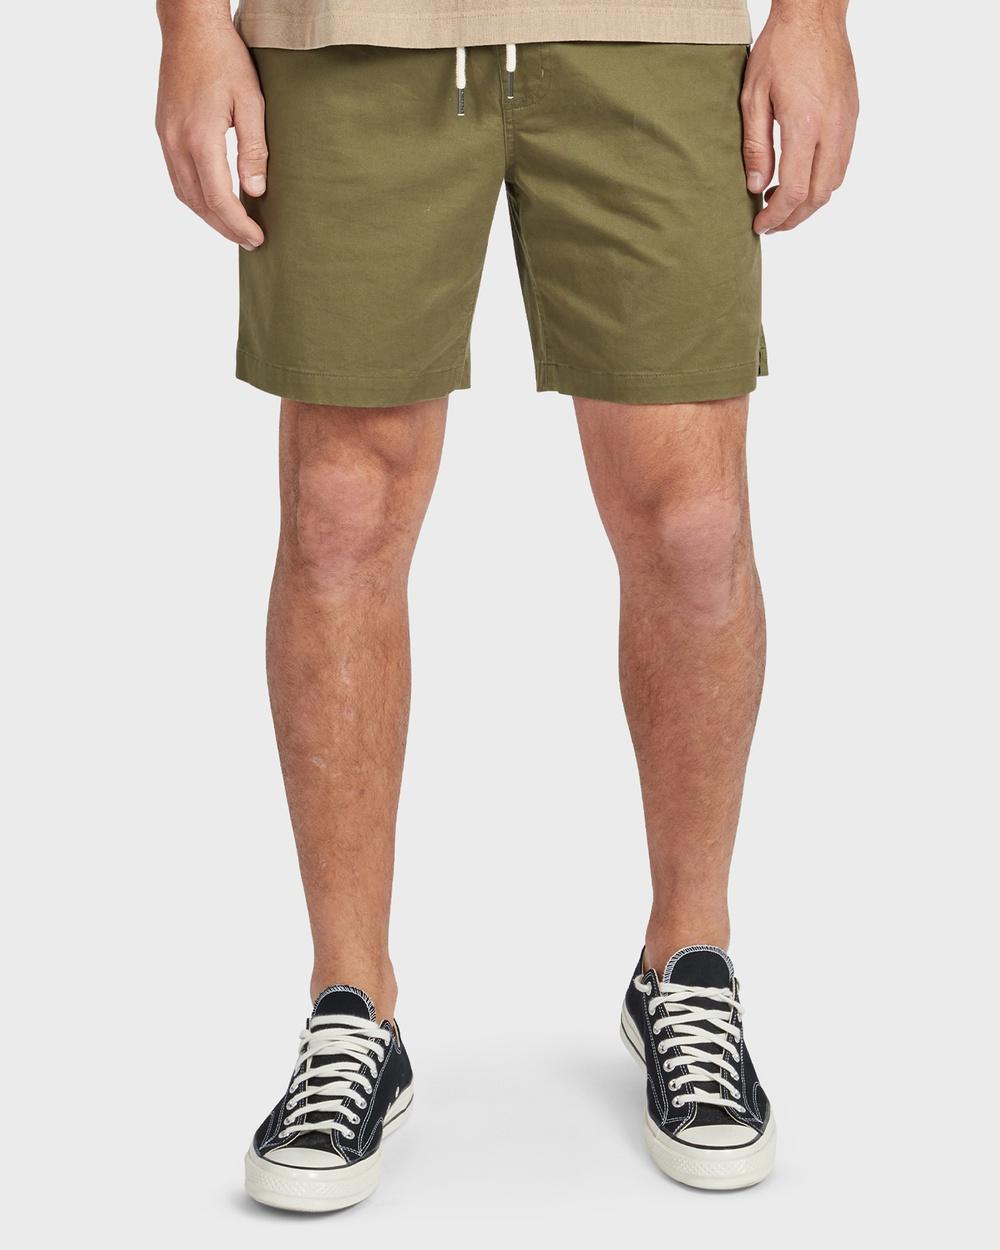 Academy Brand Volley Short Shorts Green